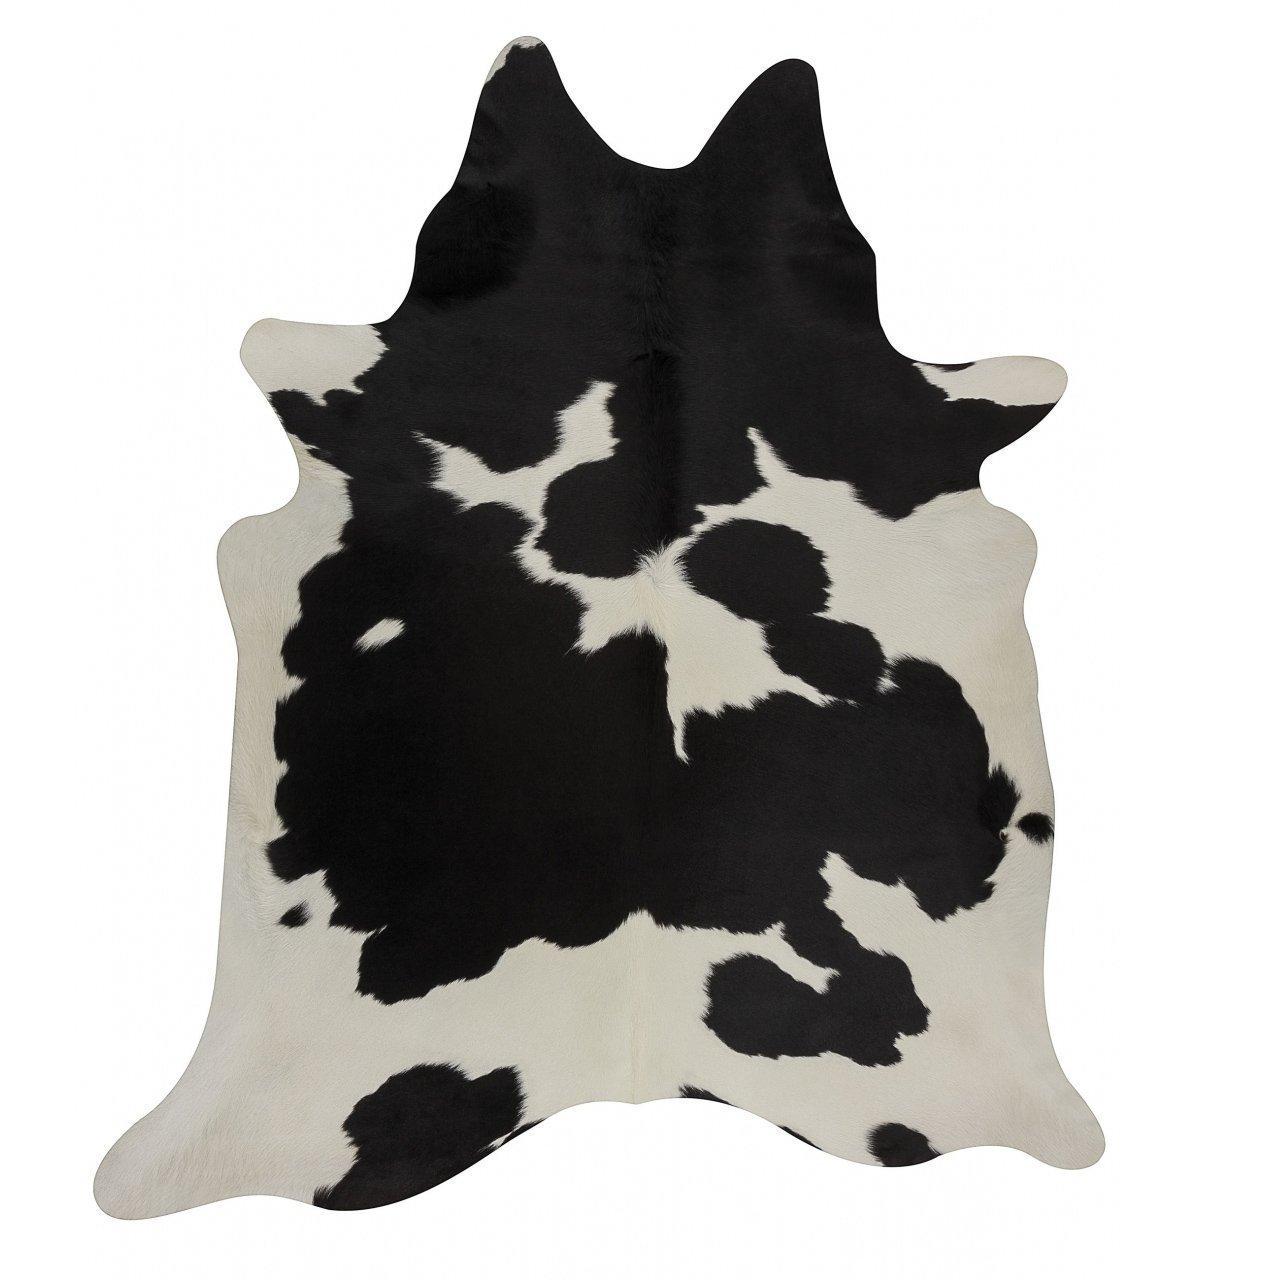 Splendid Decor Black White Cowhide Rug Black Cow Skin Leather Rug - Pure Cowhide Rug (5 X 4)